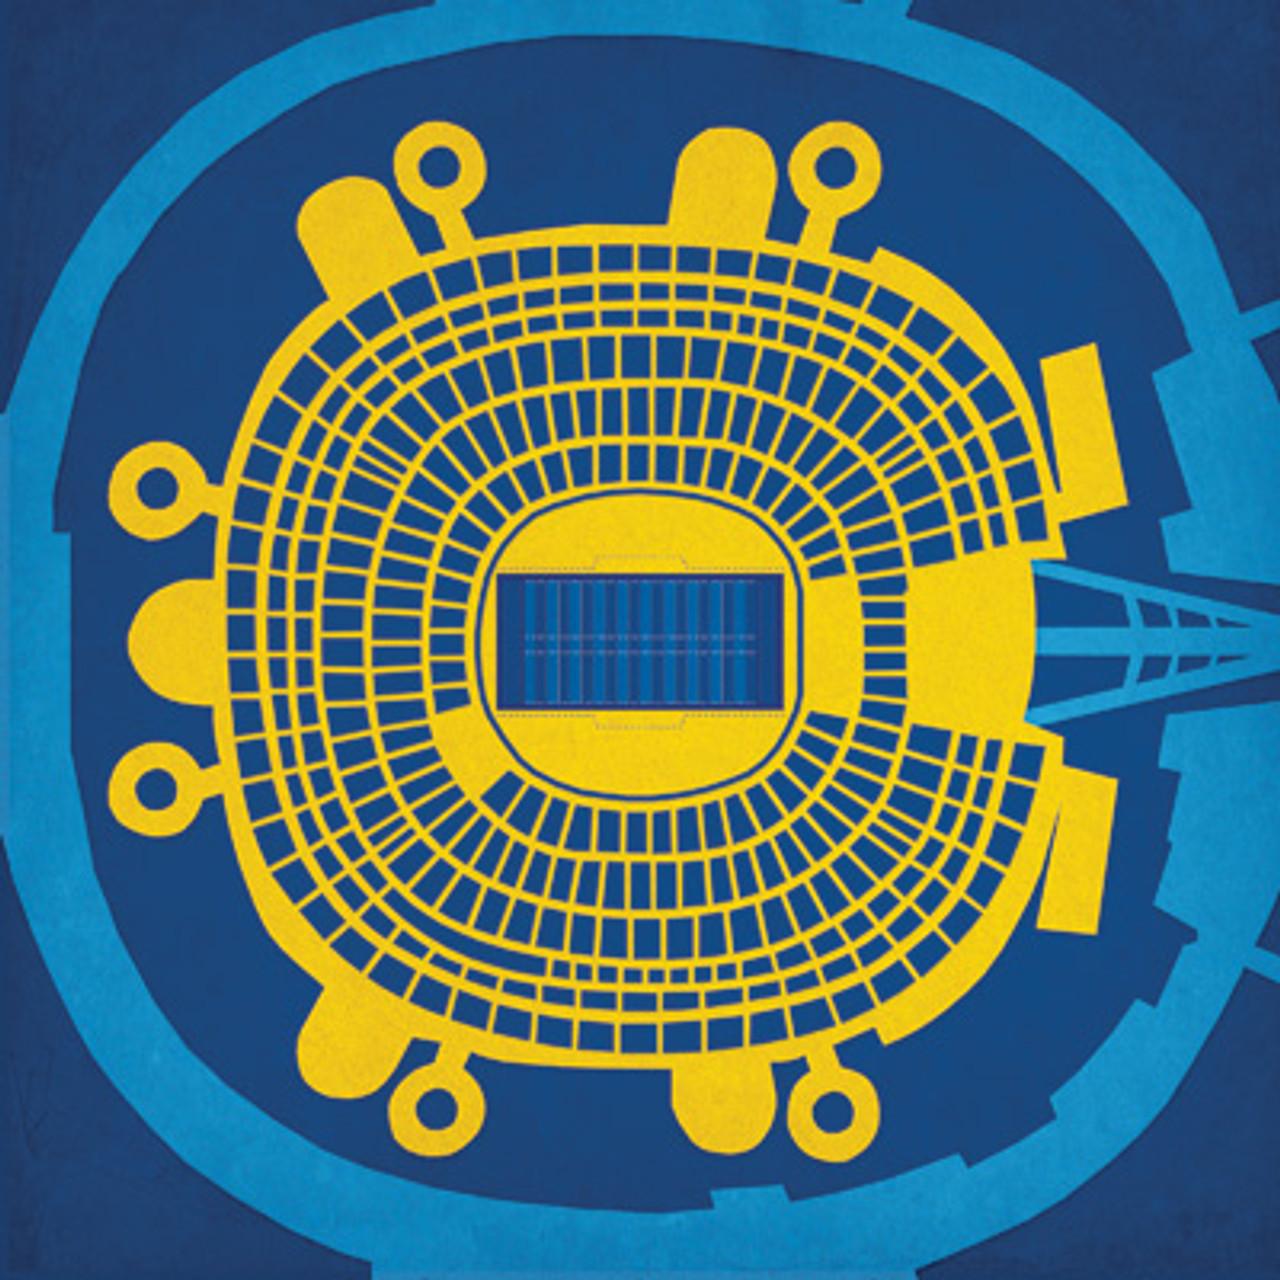 Qualcomm Stadium - San Diego Chargers City Card